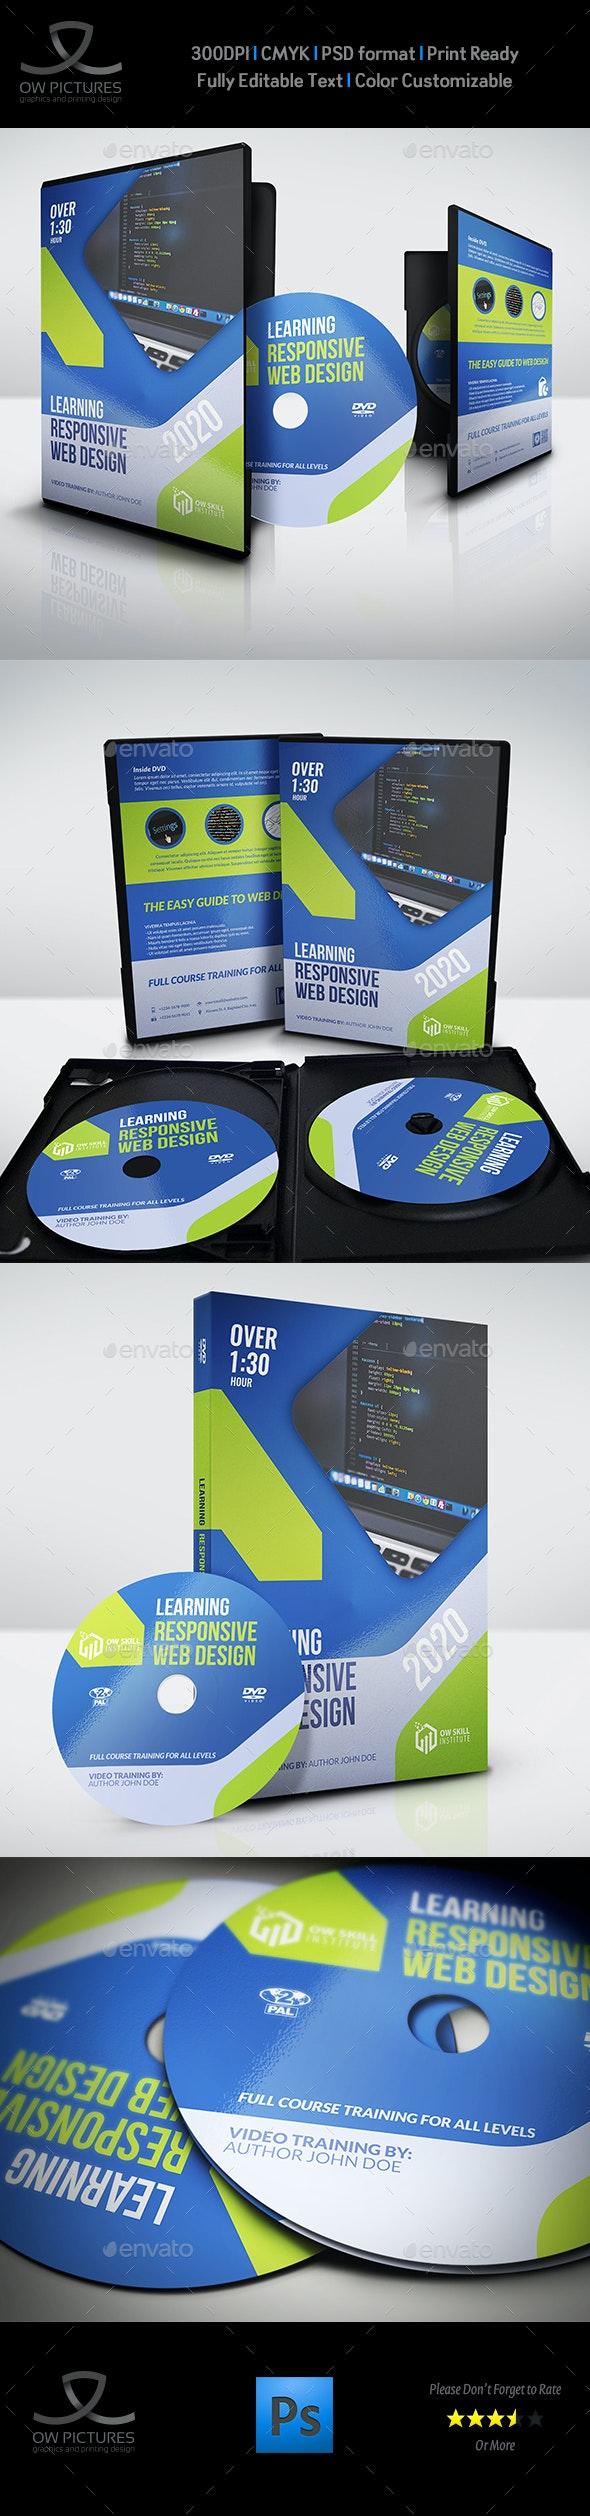 Training Course DVD Template Vol.3 - CD & DVD Artwork Print Templates